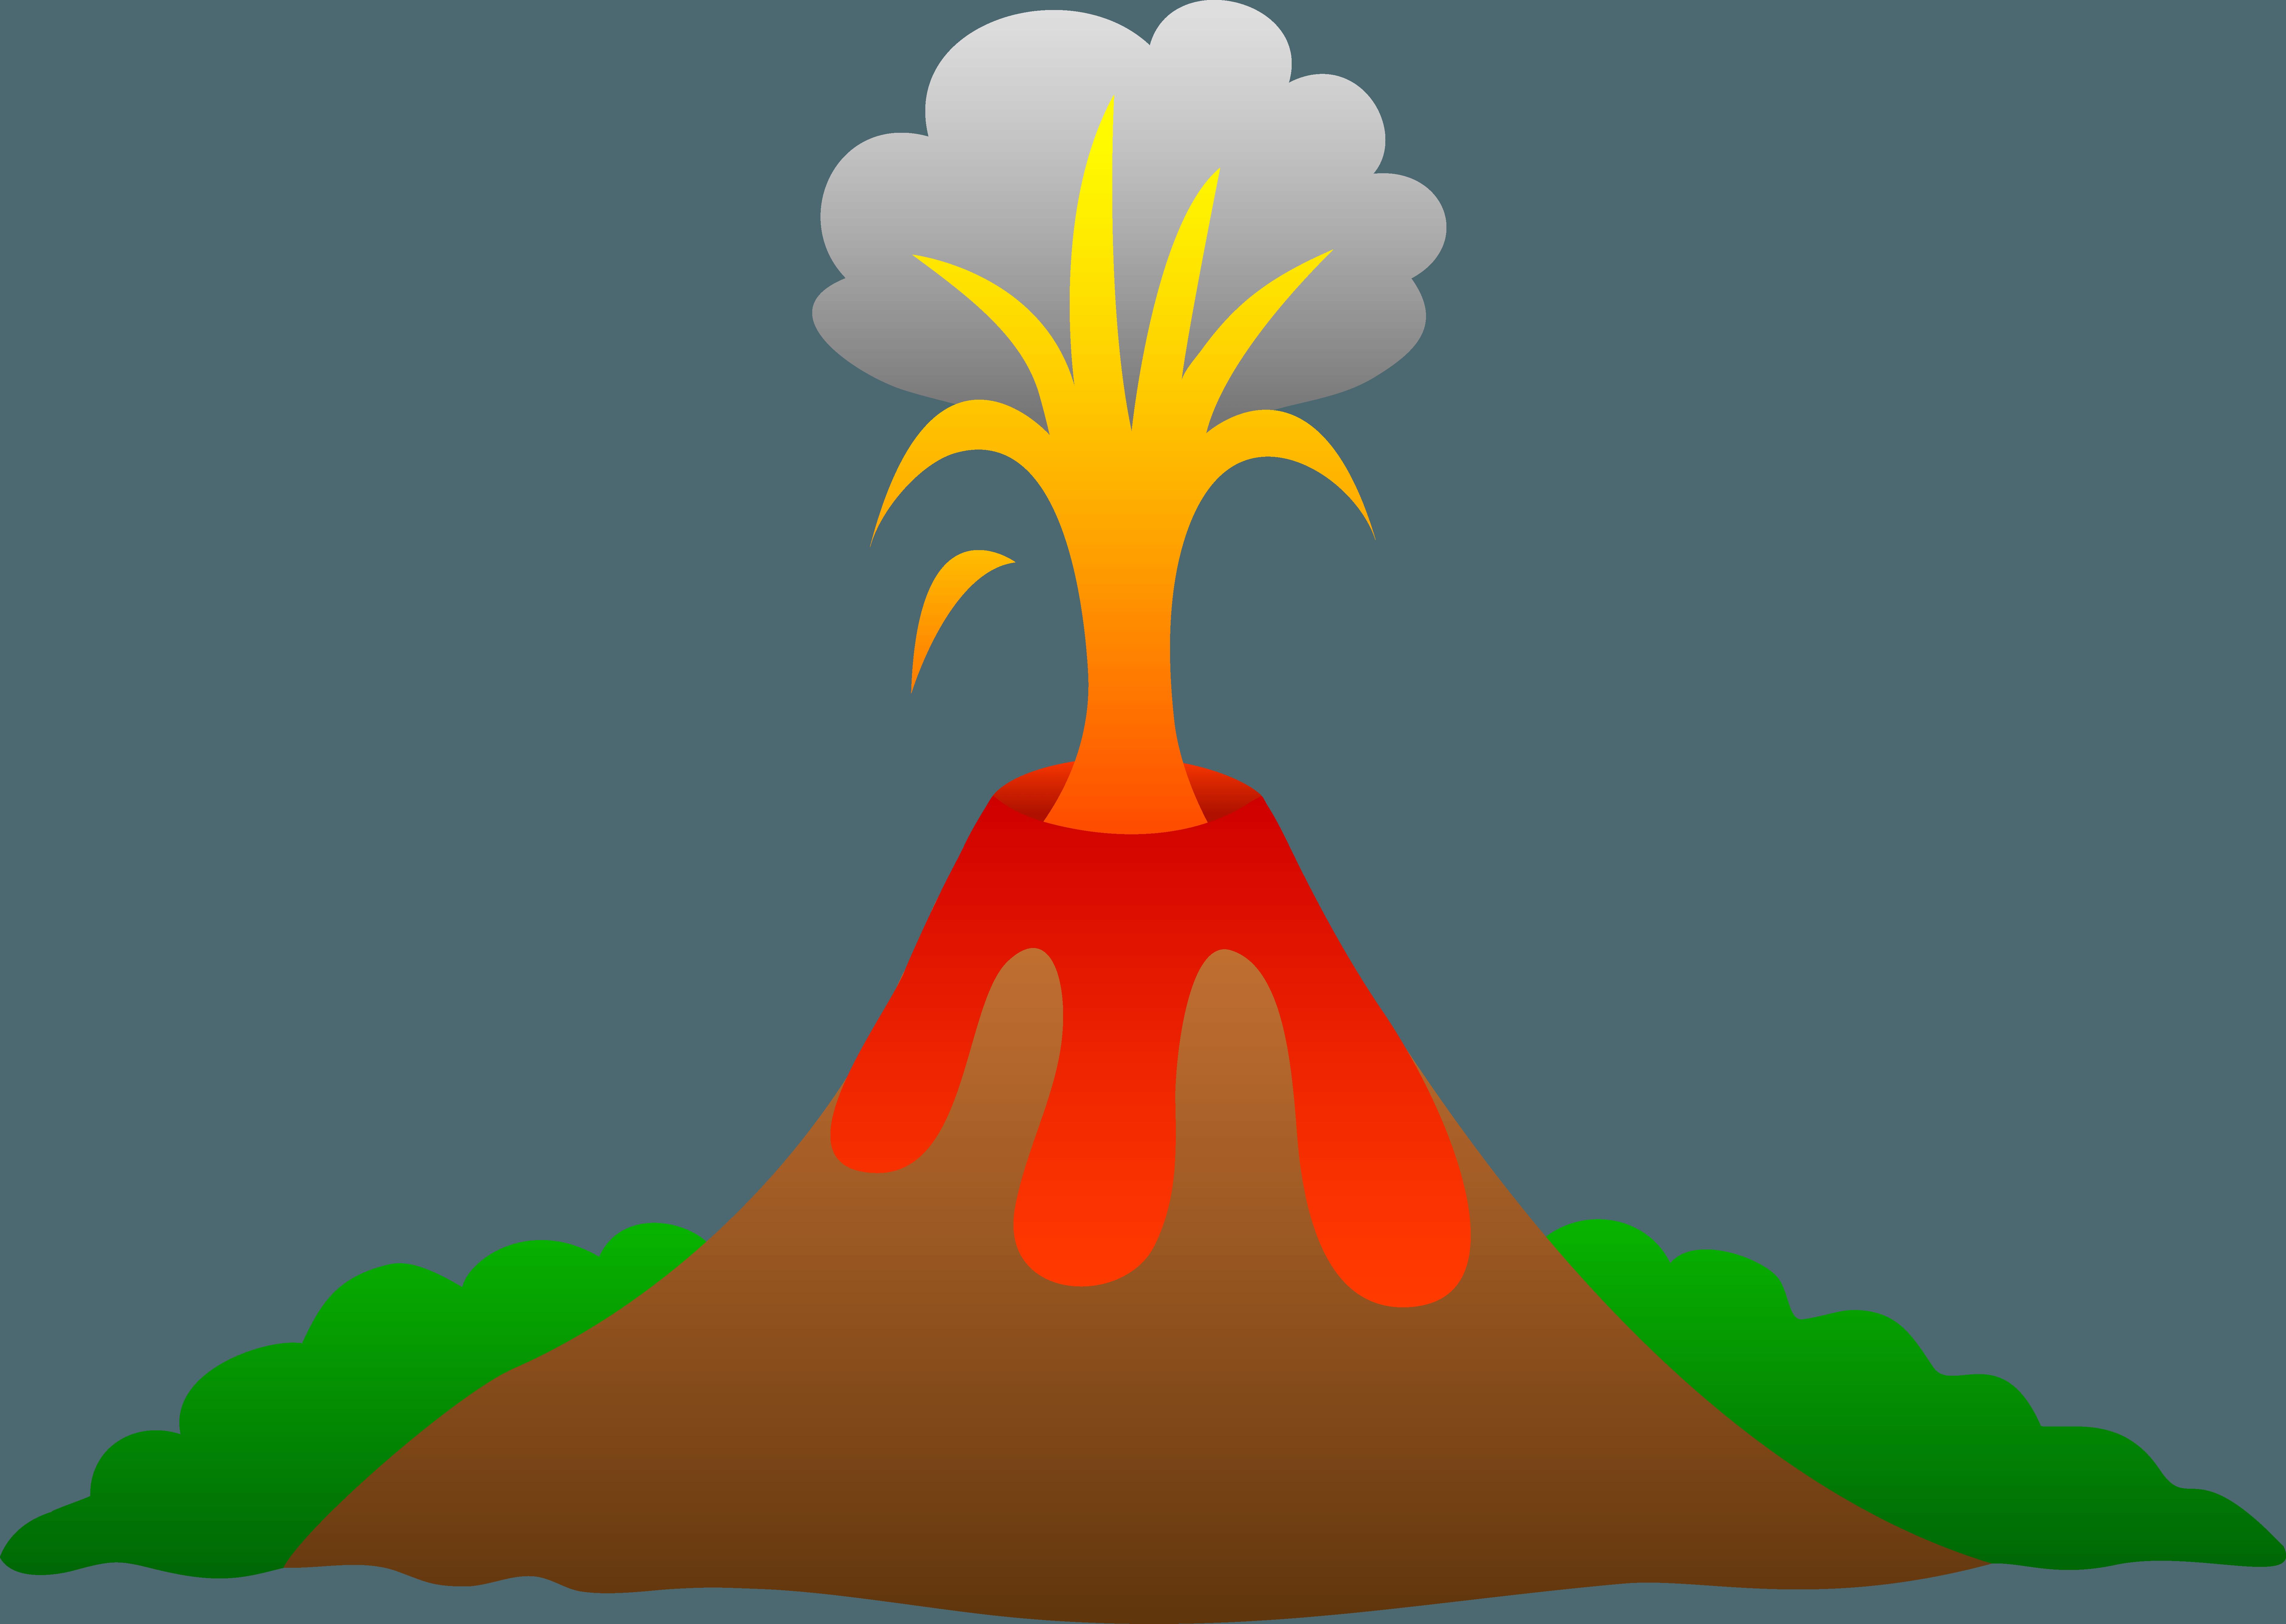 V Is For Volcano Clipart Dormant volcano clipar...